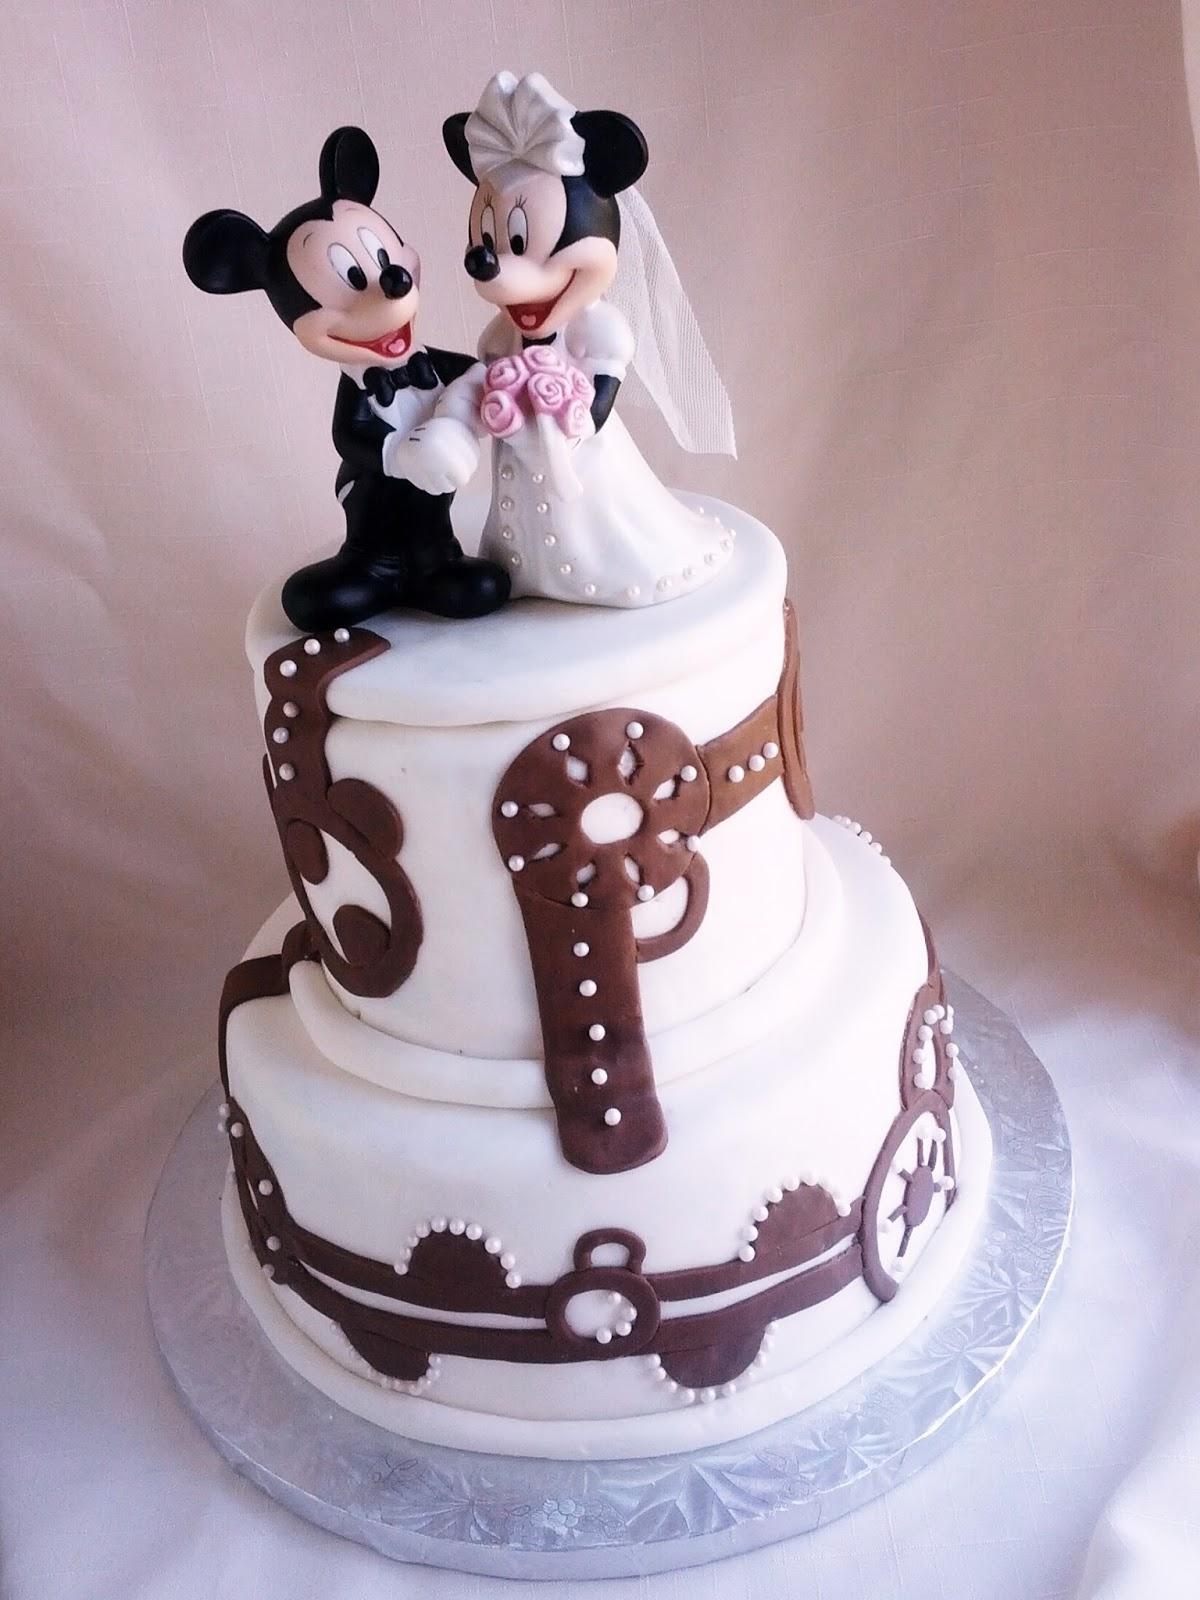 Second Generation Cake Design: Mickey & Minnie Wedding Cake